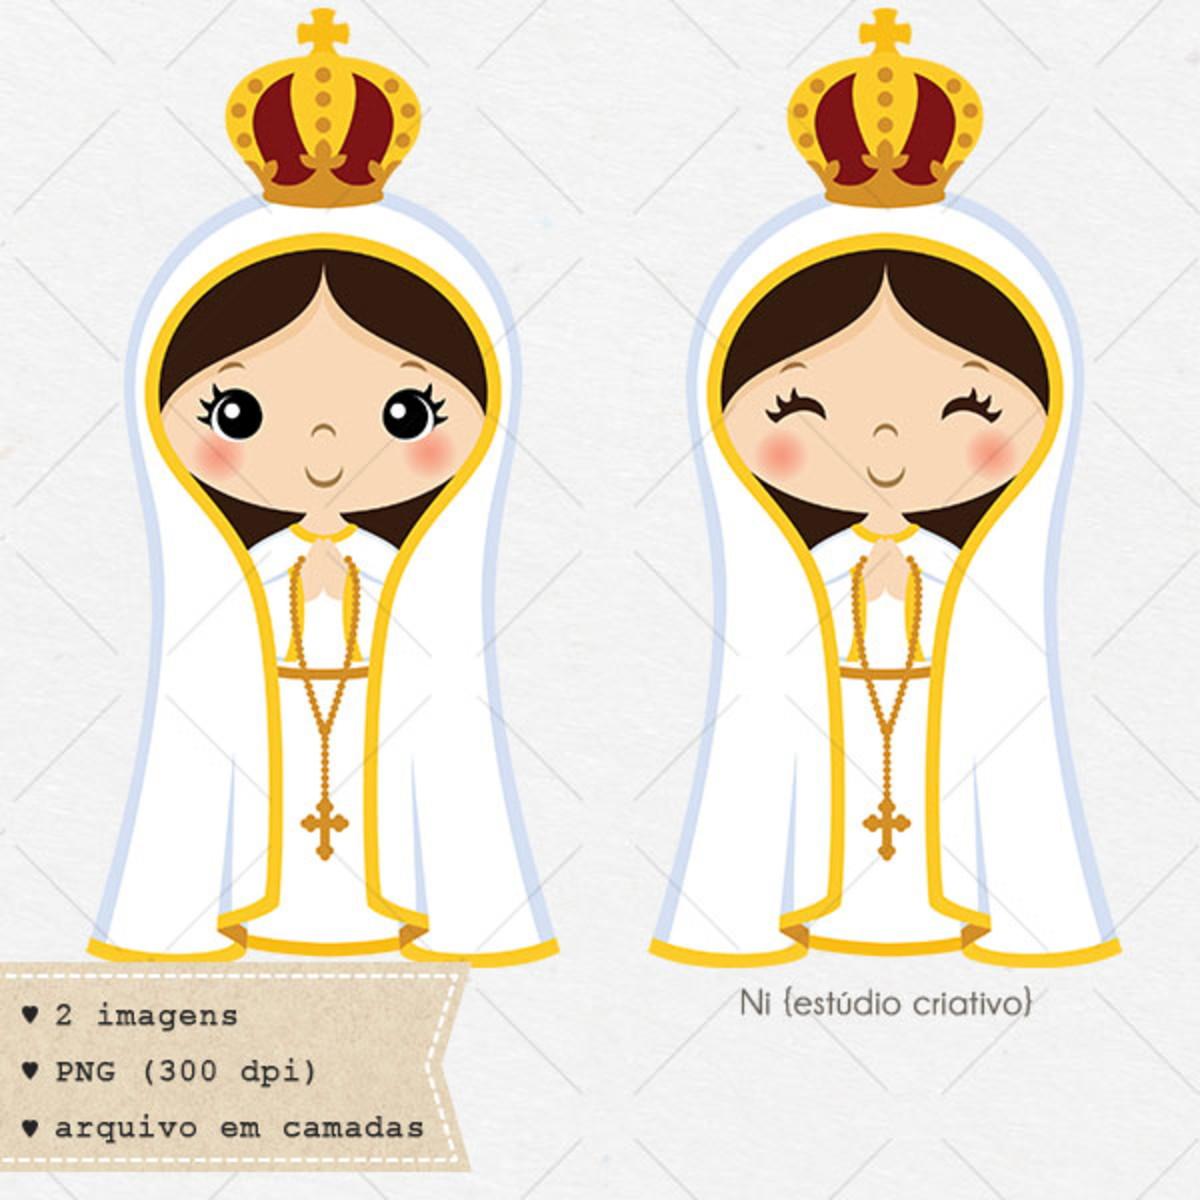 Nossa Senhora De Fatima Clipart Vetor No Elo7 Ni Estudio